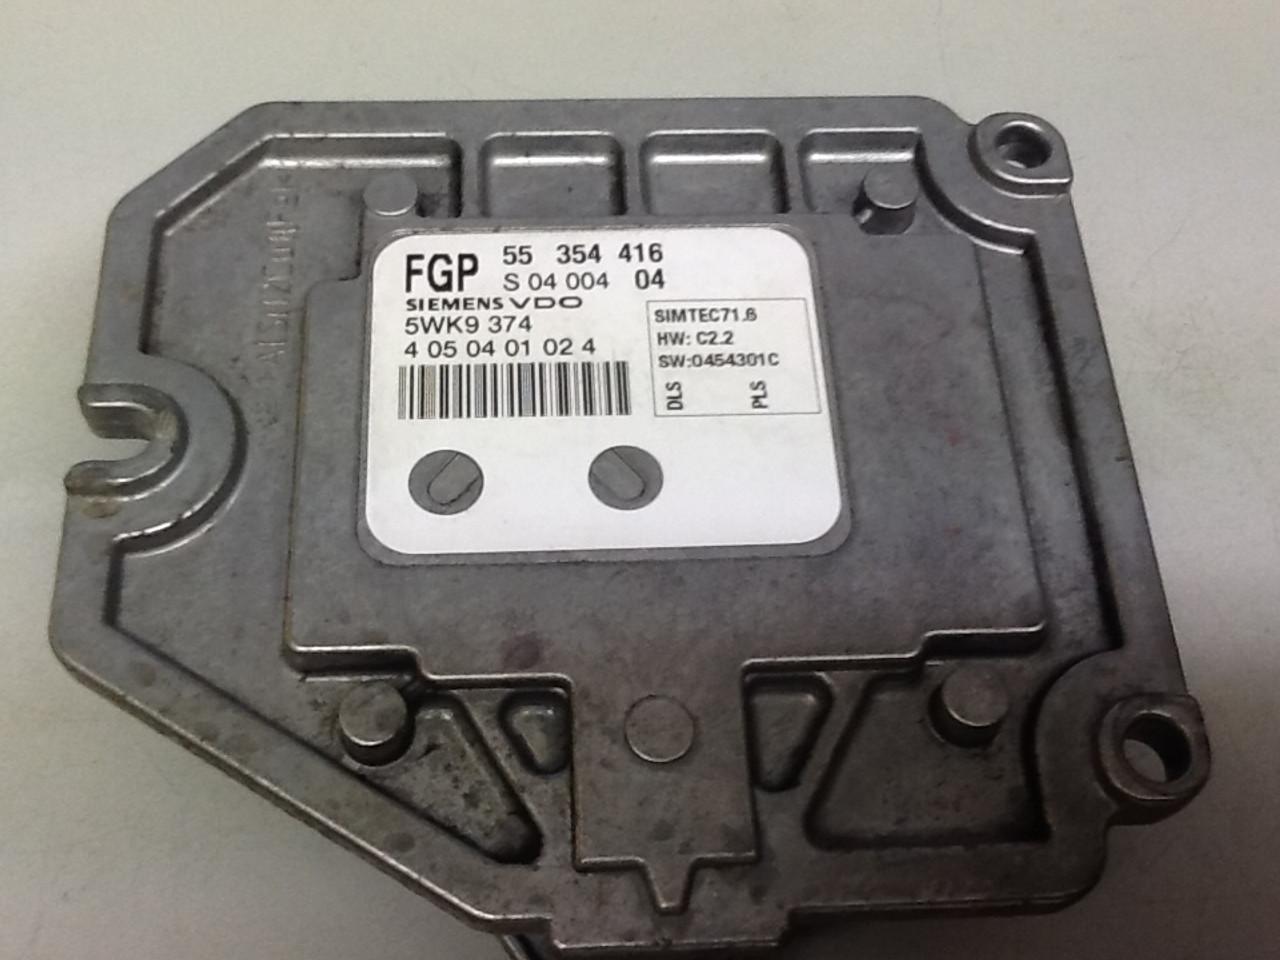 Siemens55354416 - 55 354 416S0400404 - S 04 004 045WK9374 - 5WK9 374SIMTEC71.6